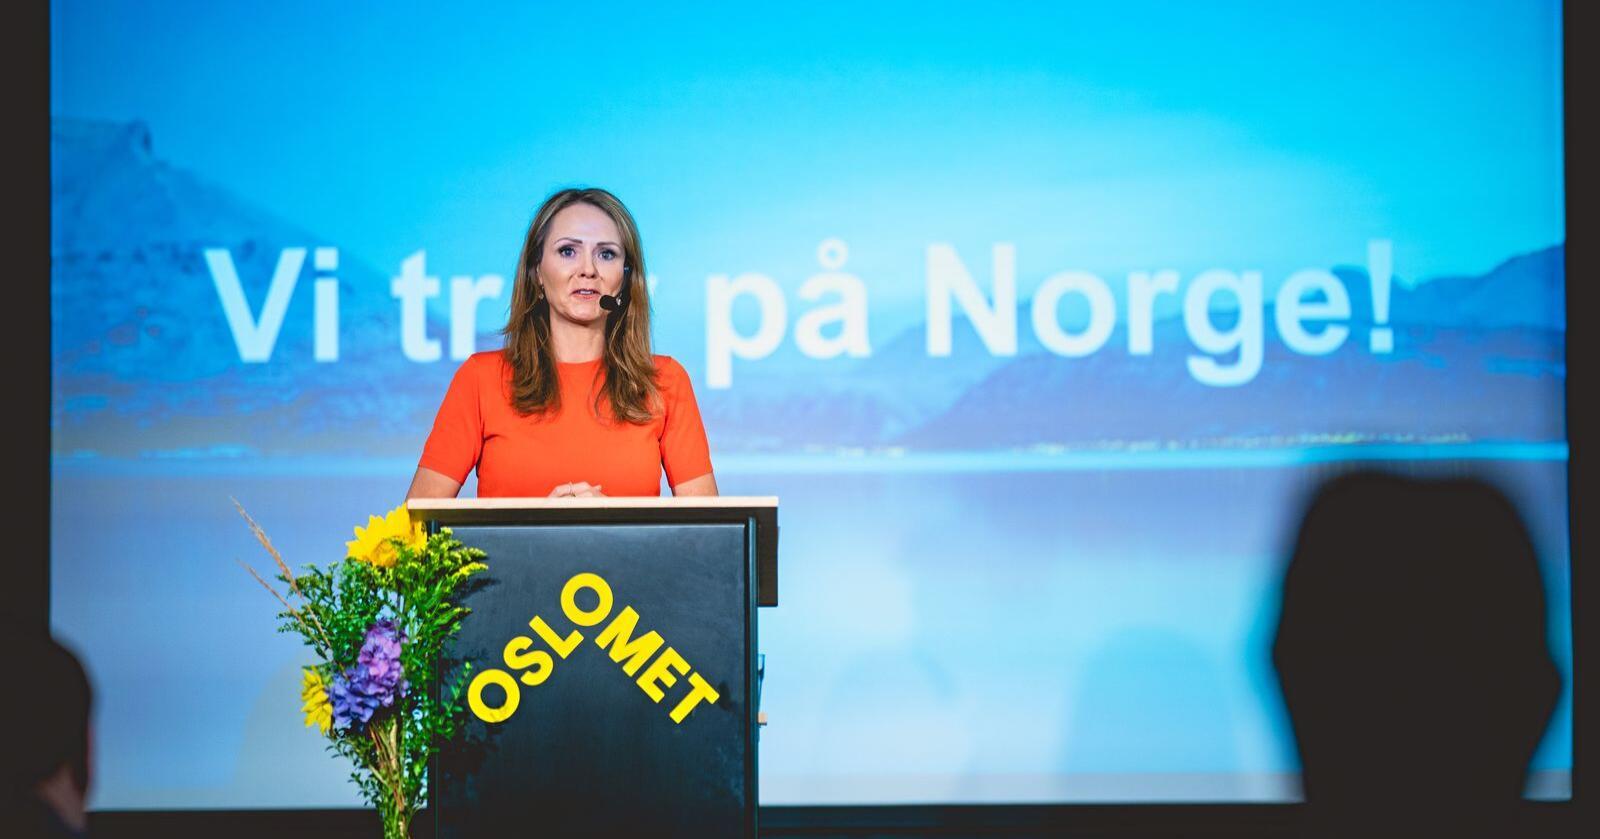 Denne veka presenterte leiar for Høgres programkomité, Linda Hofstad Helleland, fyrsteutkast til  stortingsvalprogram. Foto: Stian Lysberg Solum / NTB scanpix